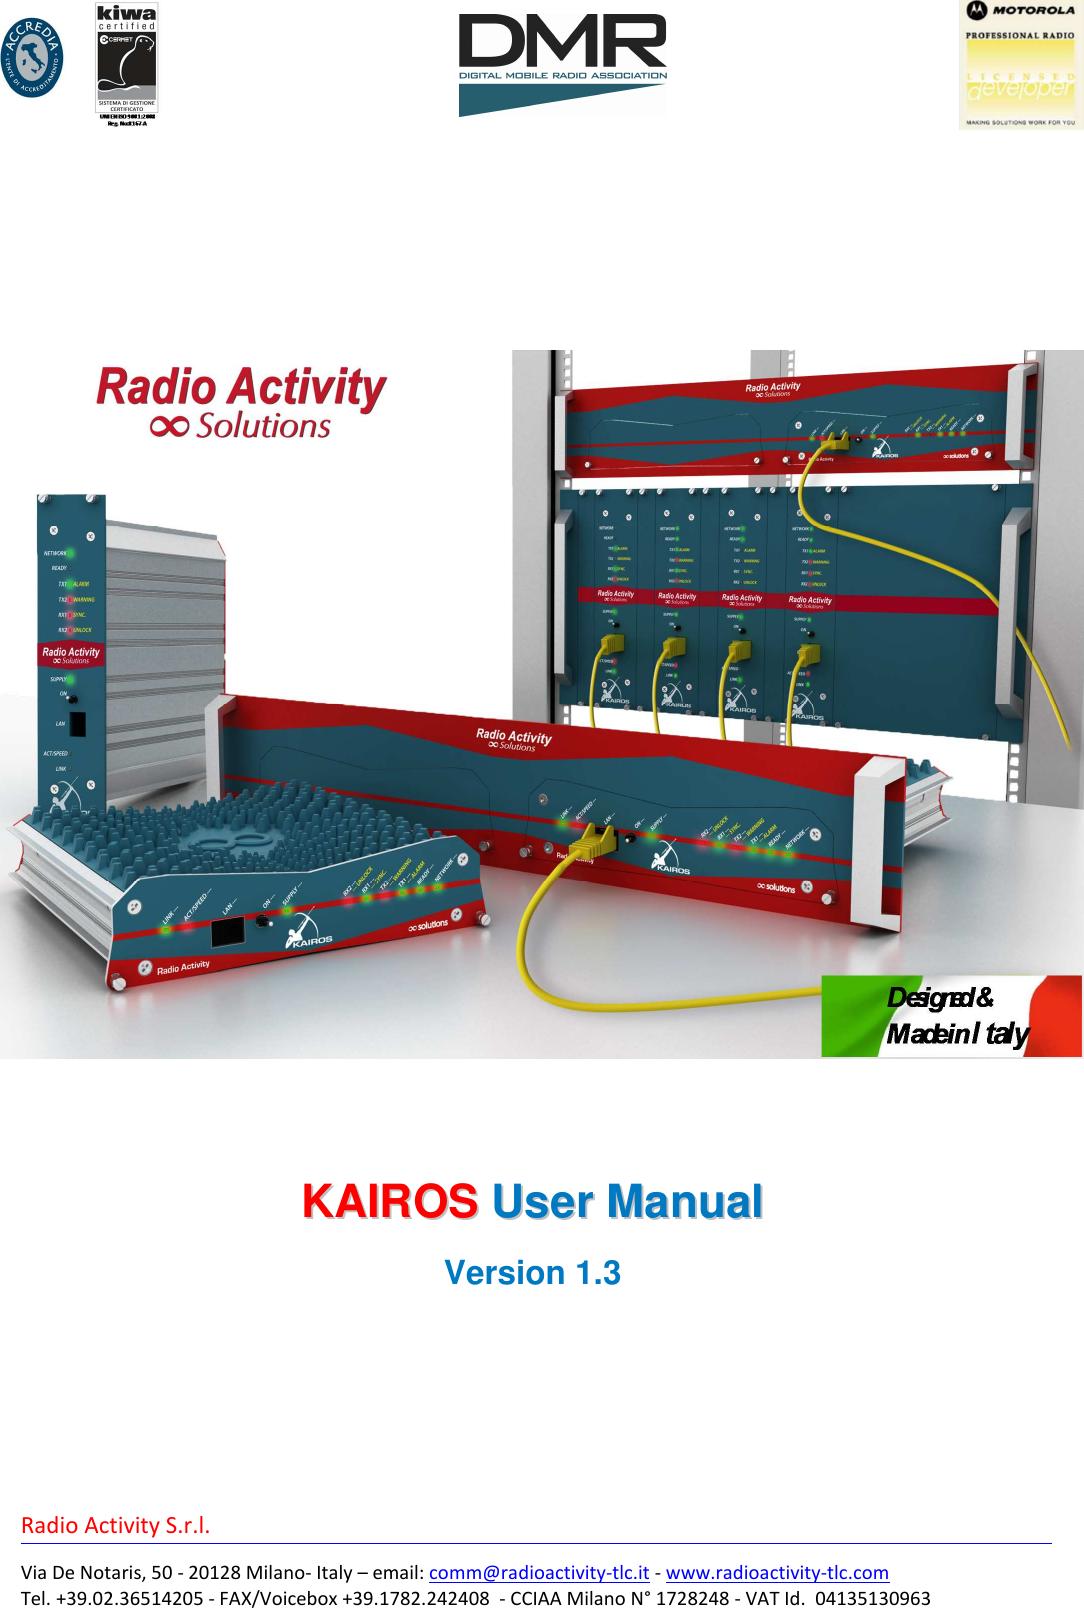 Radio Activity srl KA160 VHF BASE STATION User Manual ENB52 KAIROS 1v3